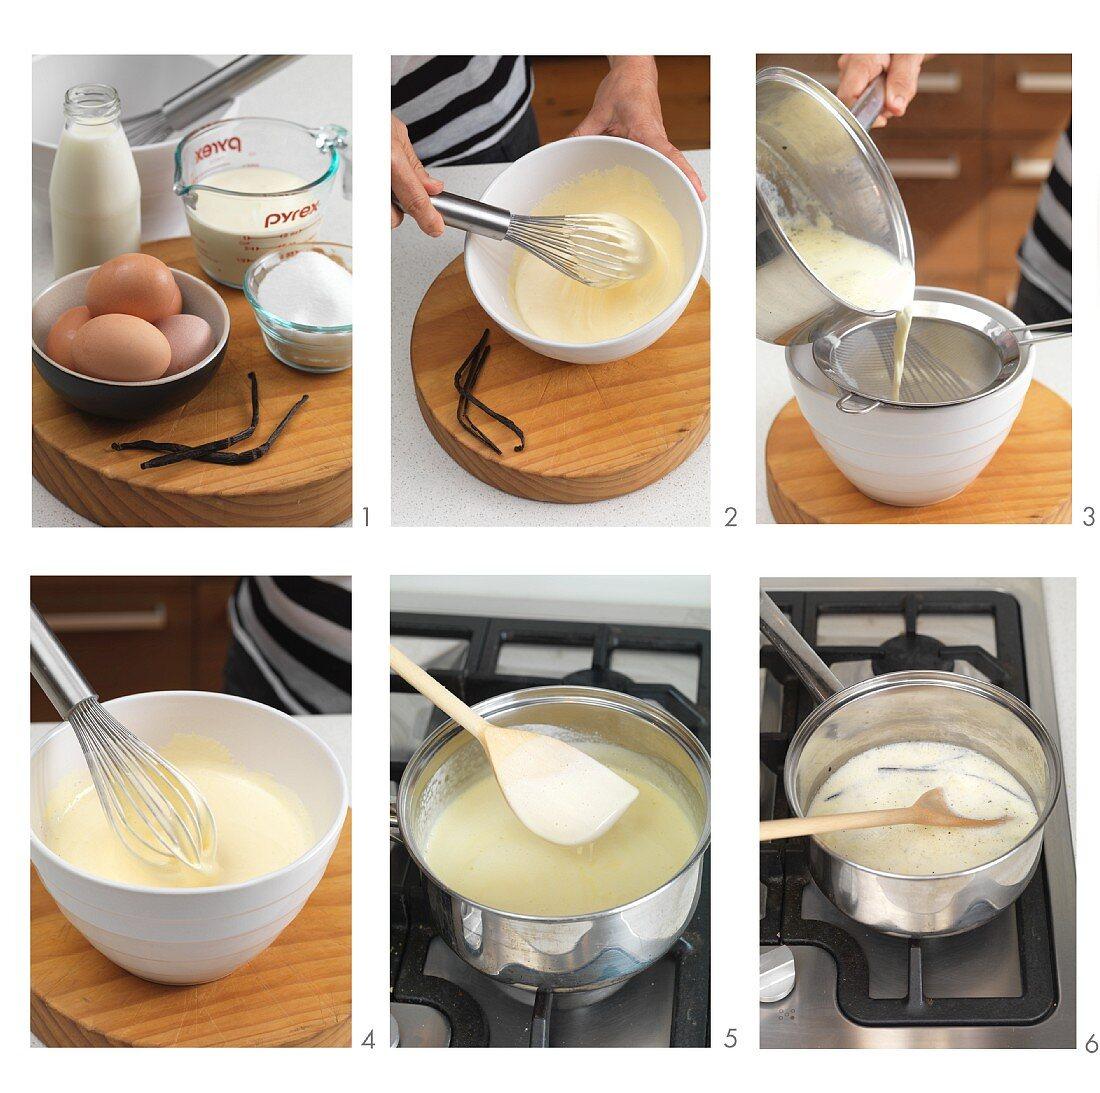 Making custard (US-English voice-over)